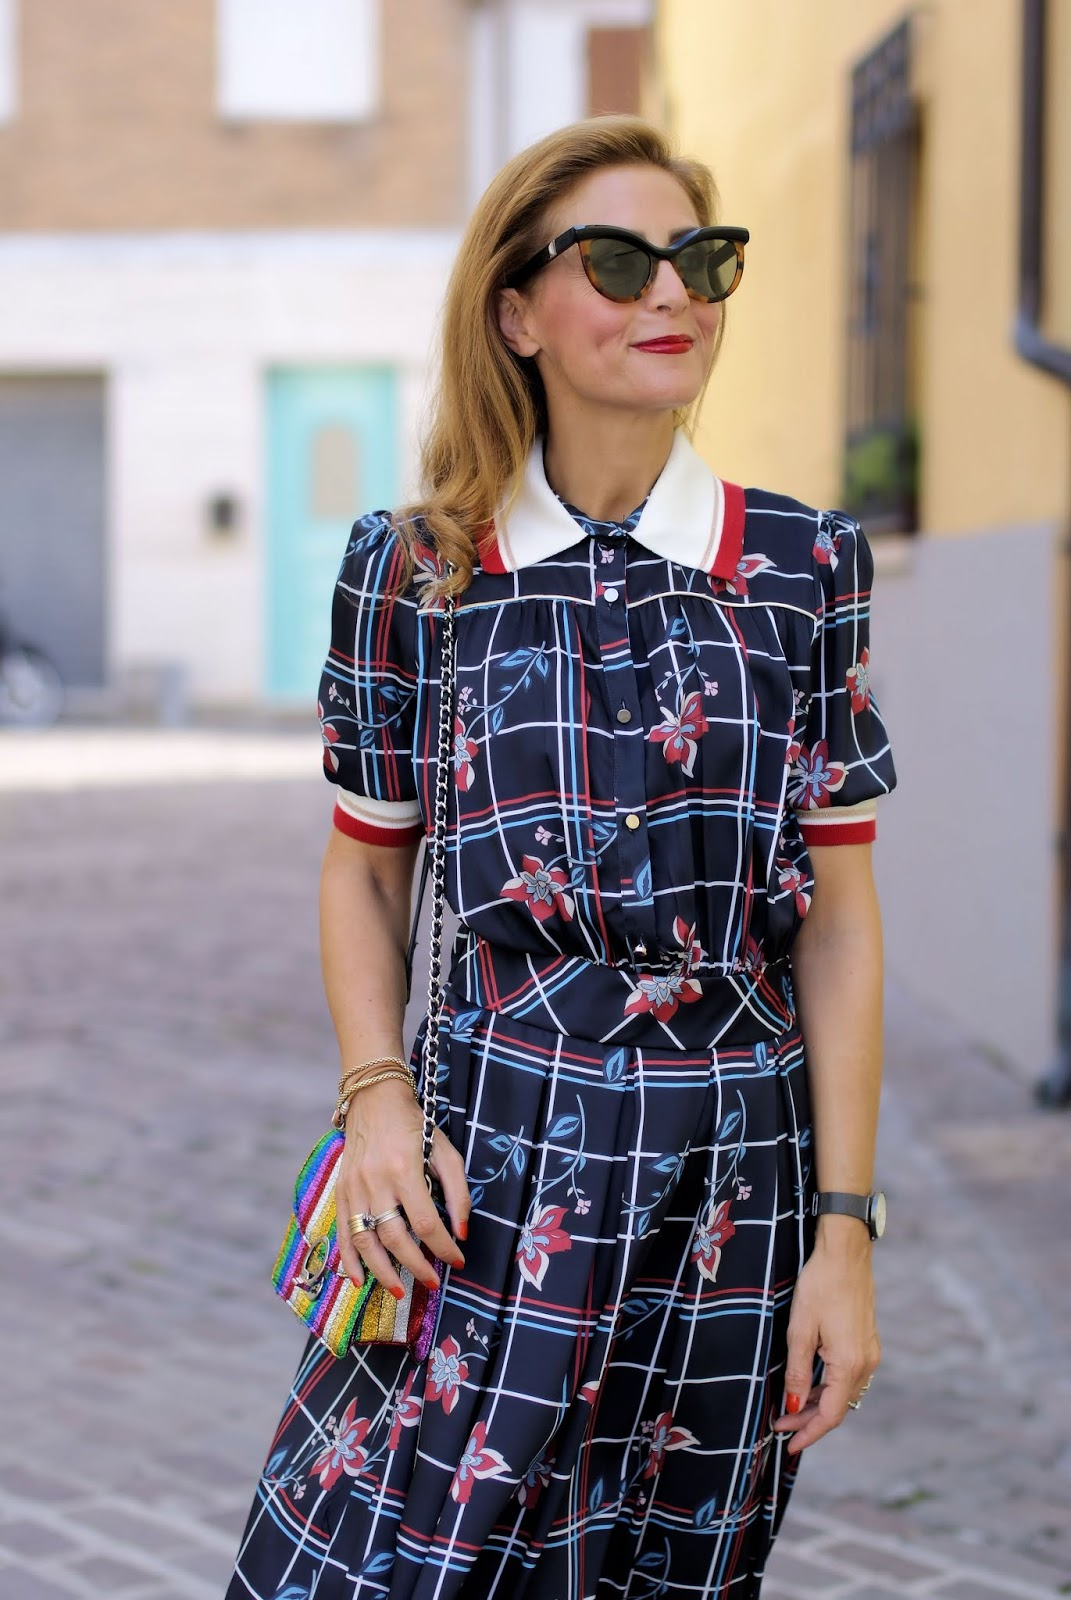 Miu Miu style white collar dress on Fashion and Cookies fashion blog, fashion blogger style